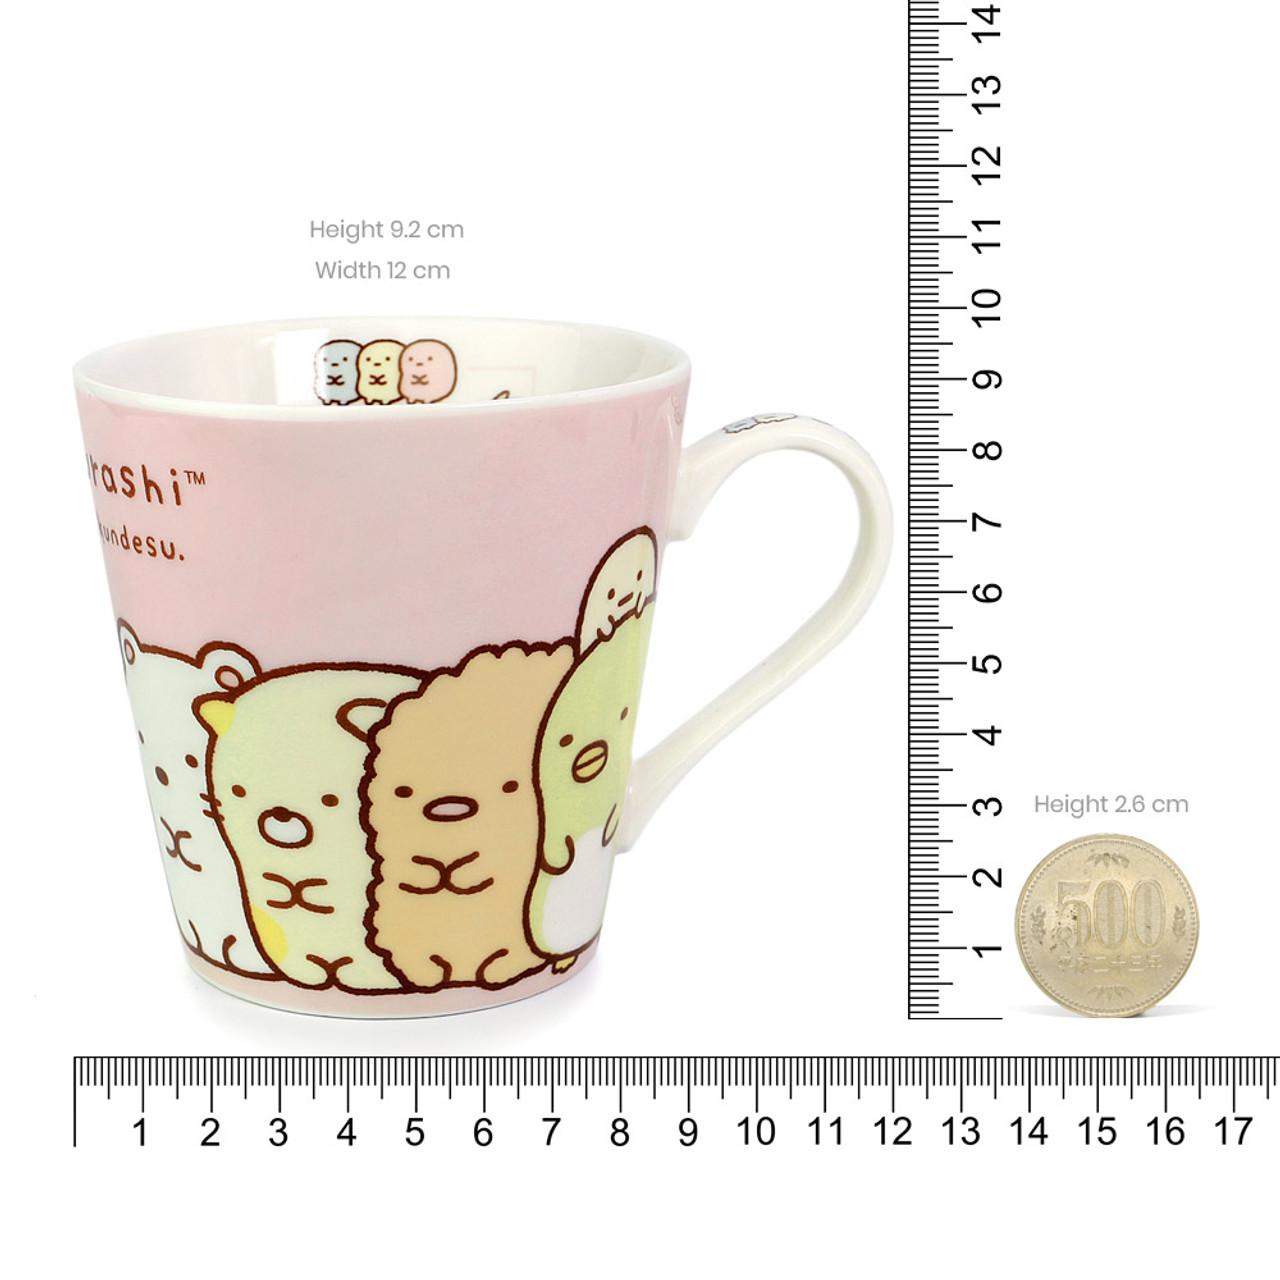 Sumikko Gurashi Measure Ceramic Cup - Horizontal ( Proportion )